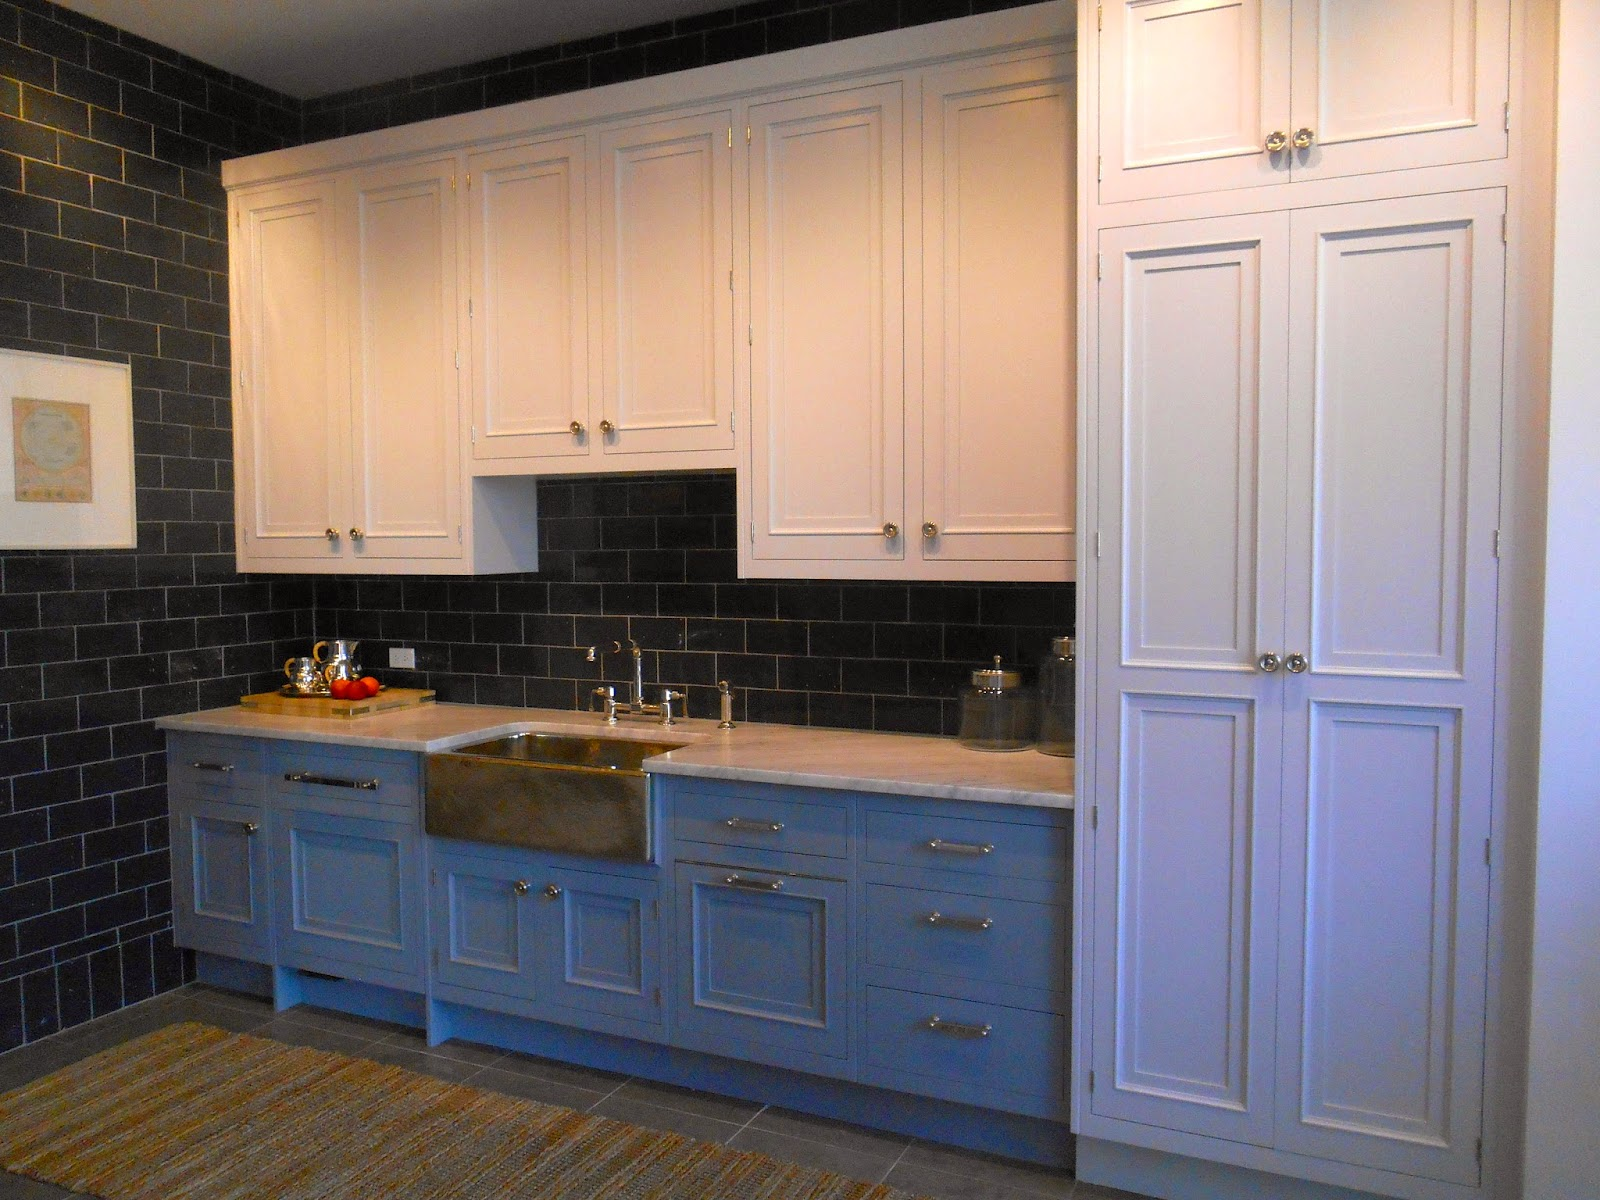 Good Waterworks New Kitchen Line Reveal!